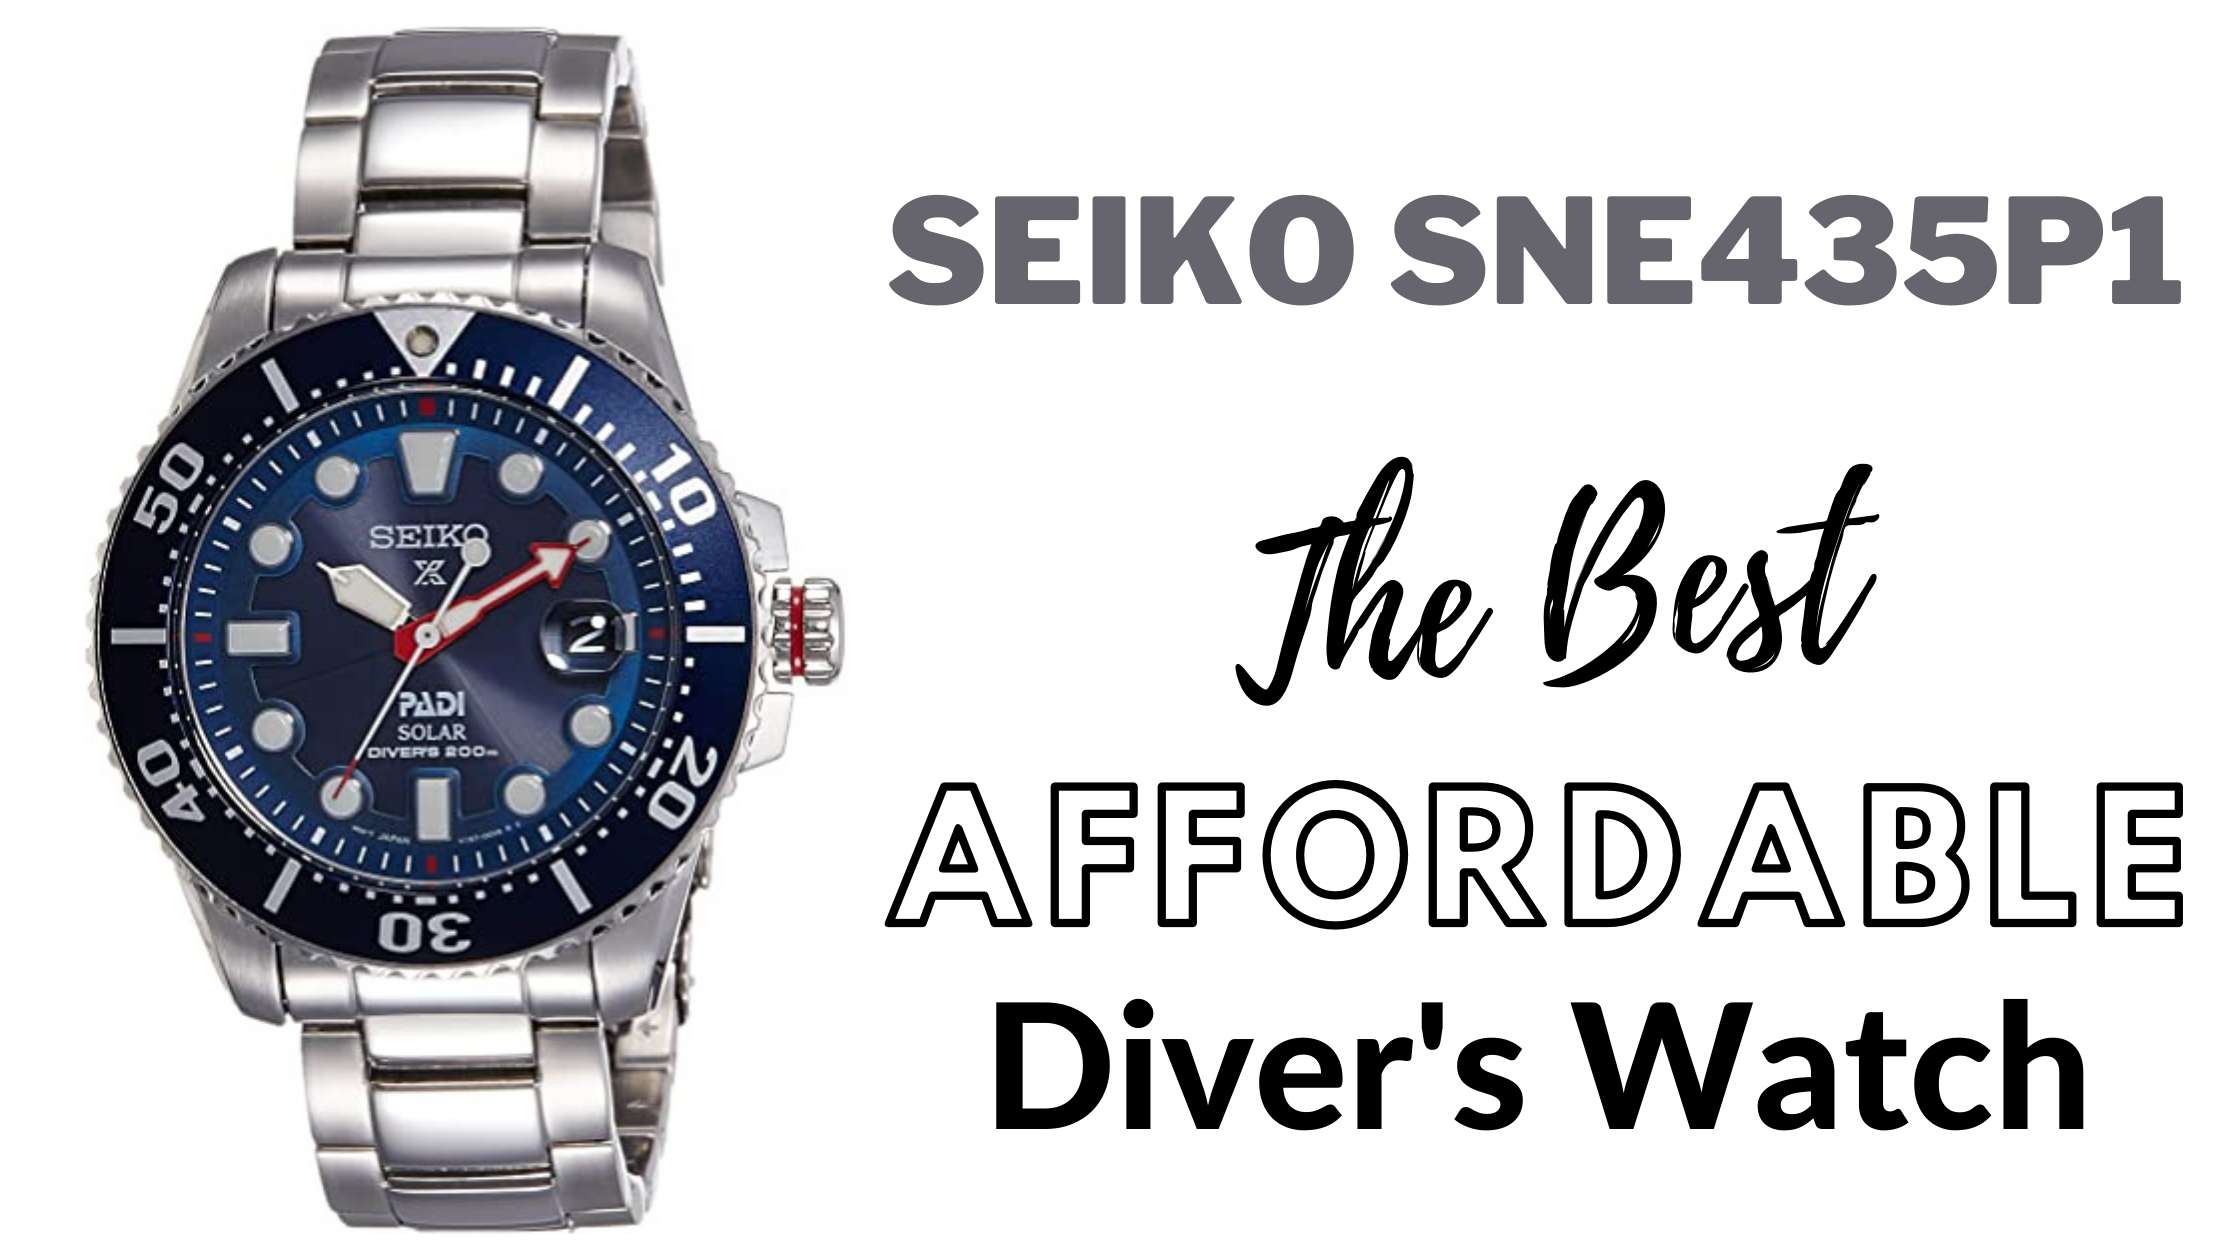 Seiko SNE435P1 Watch Review